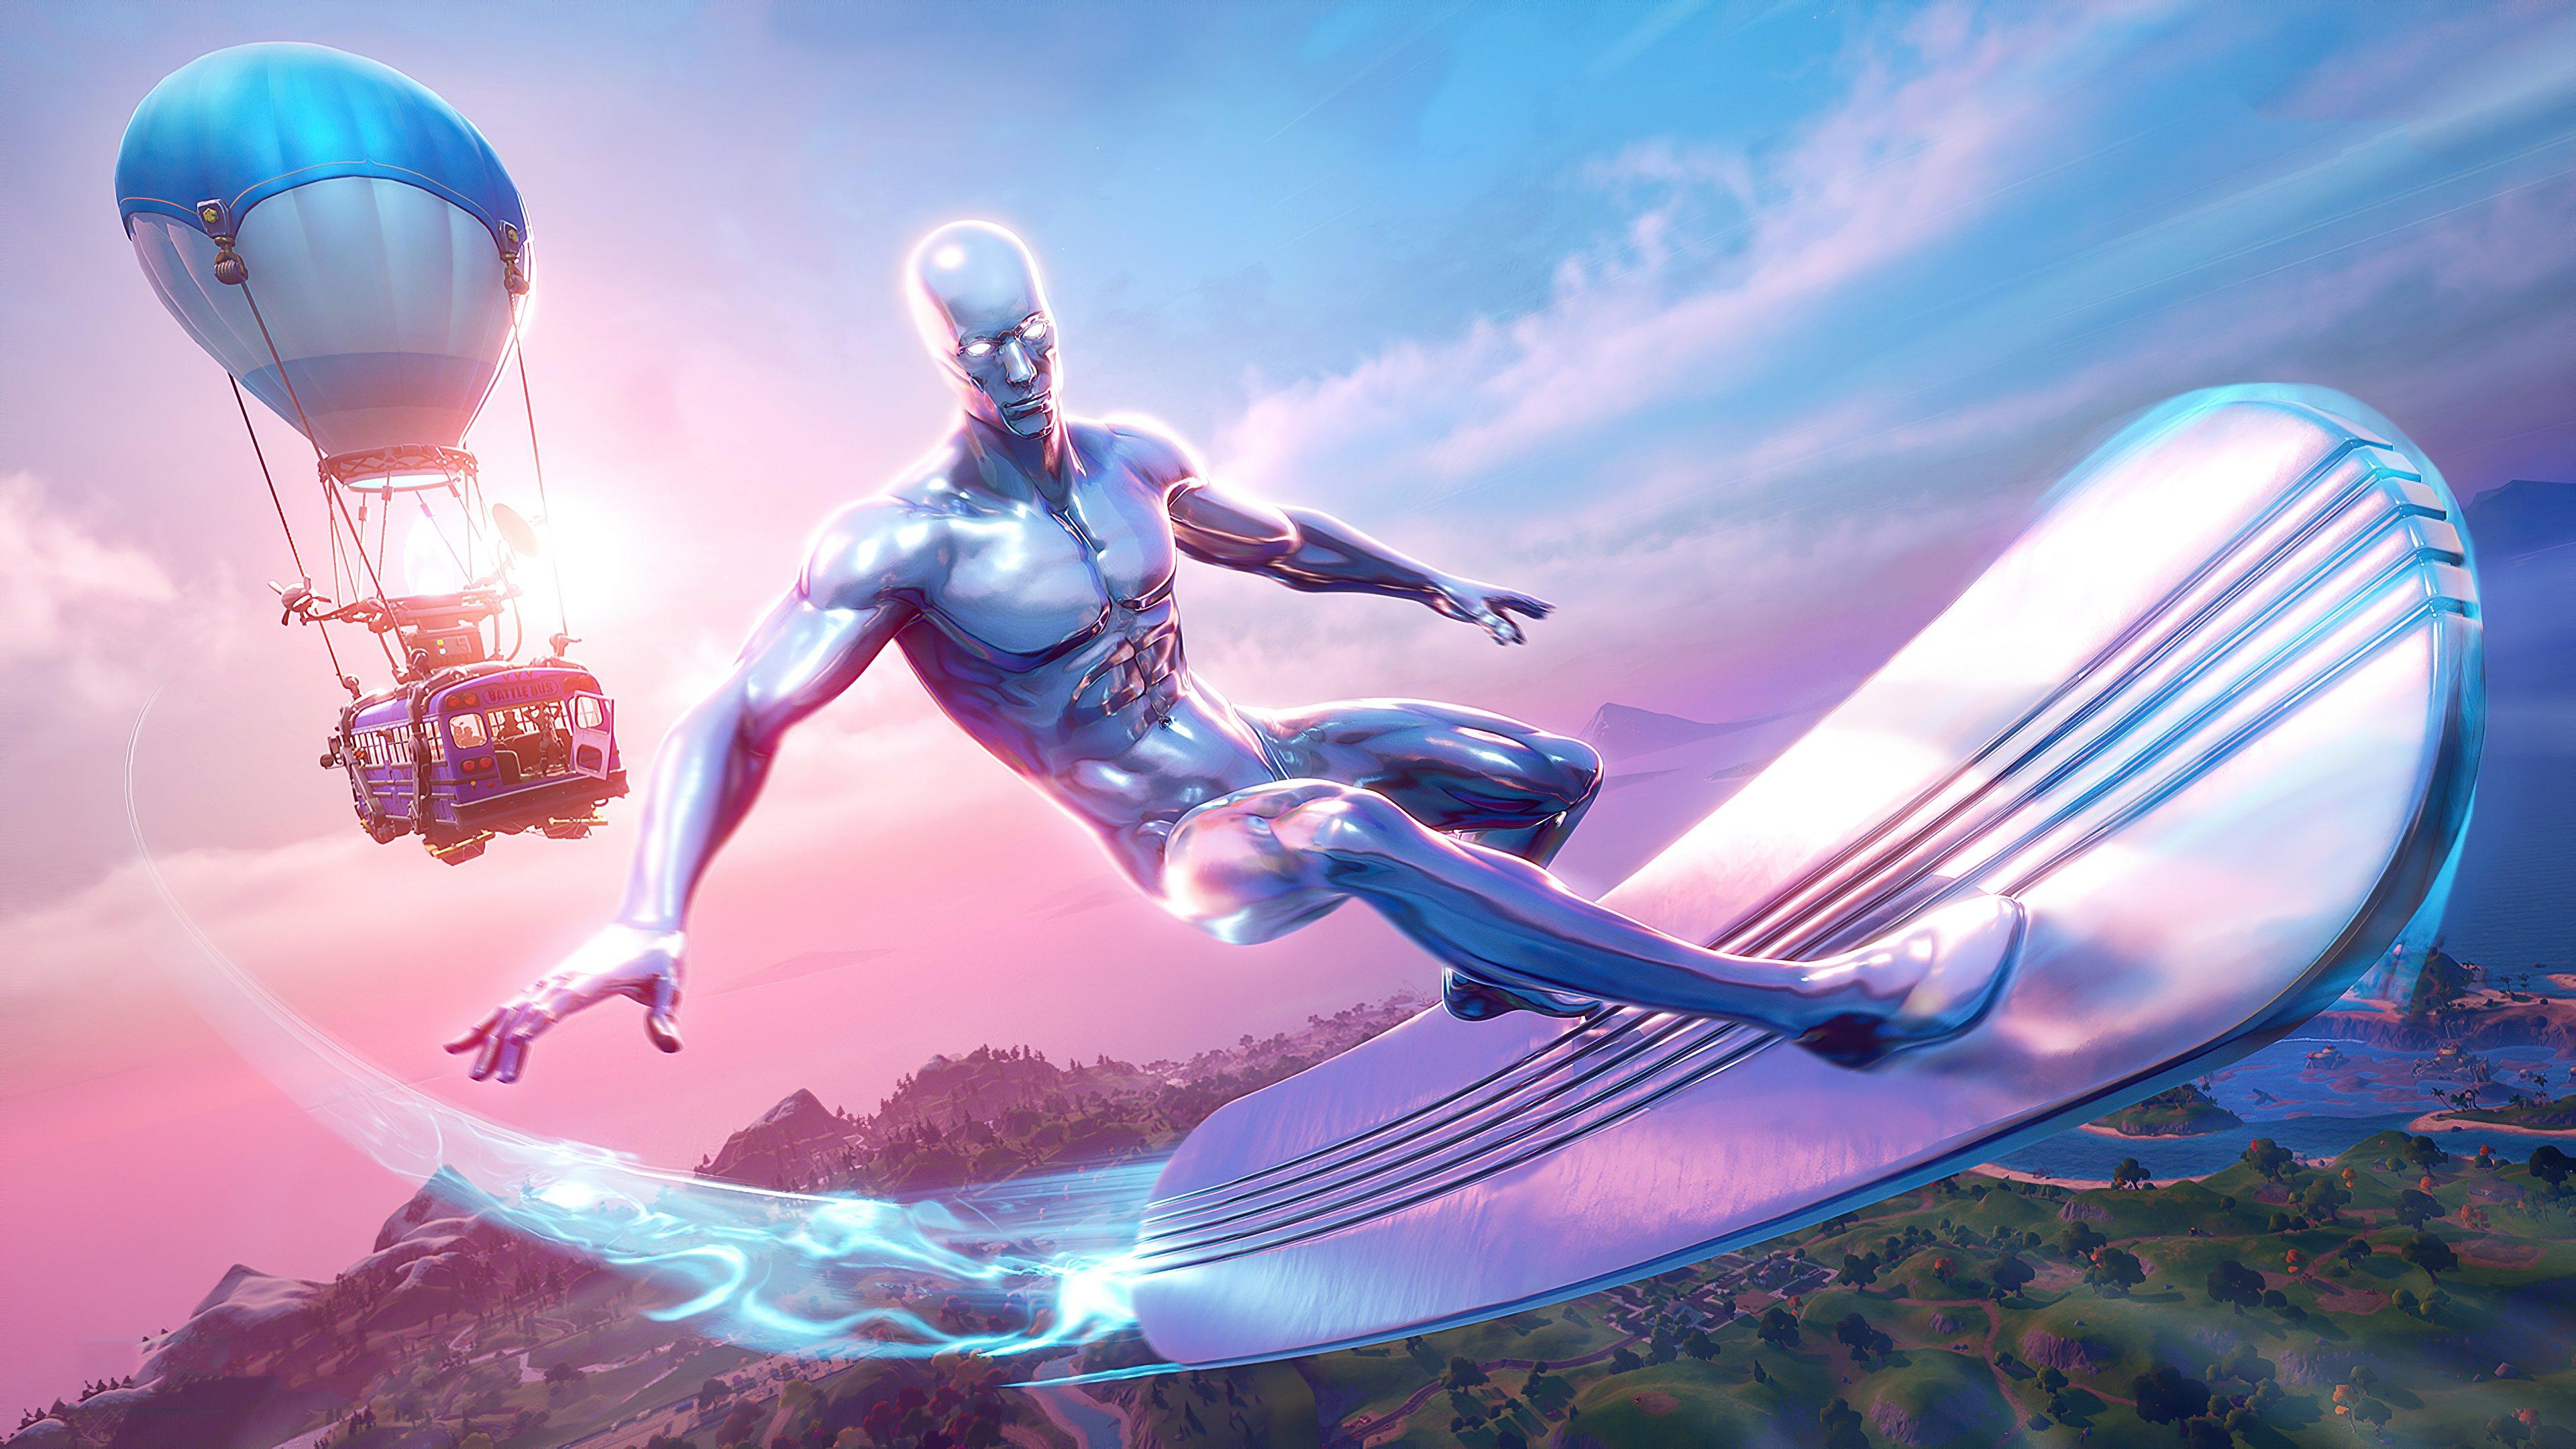 Wallpaper Silver Surfer Fortnite Season 4